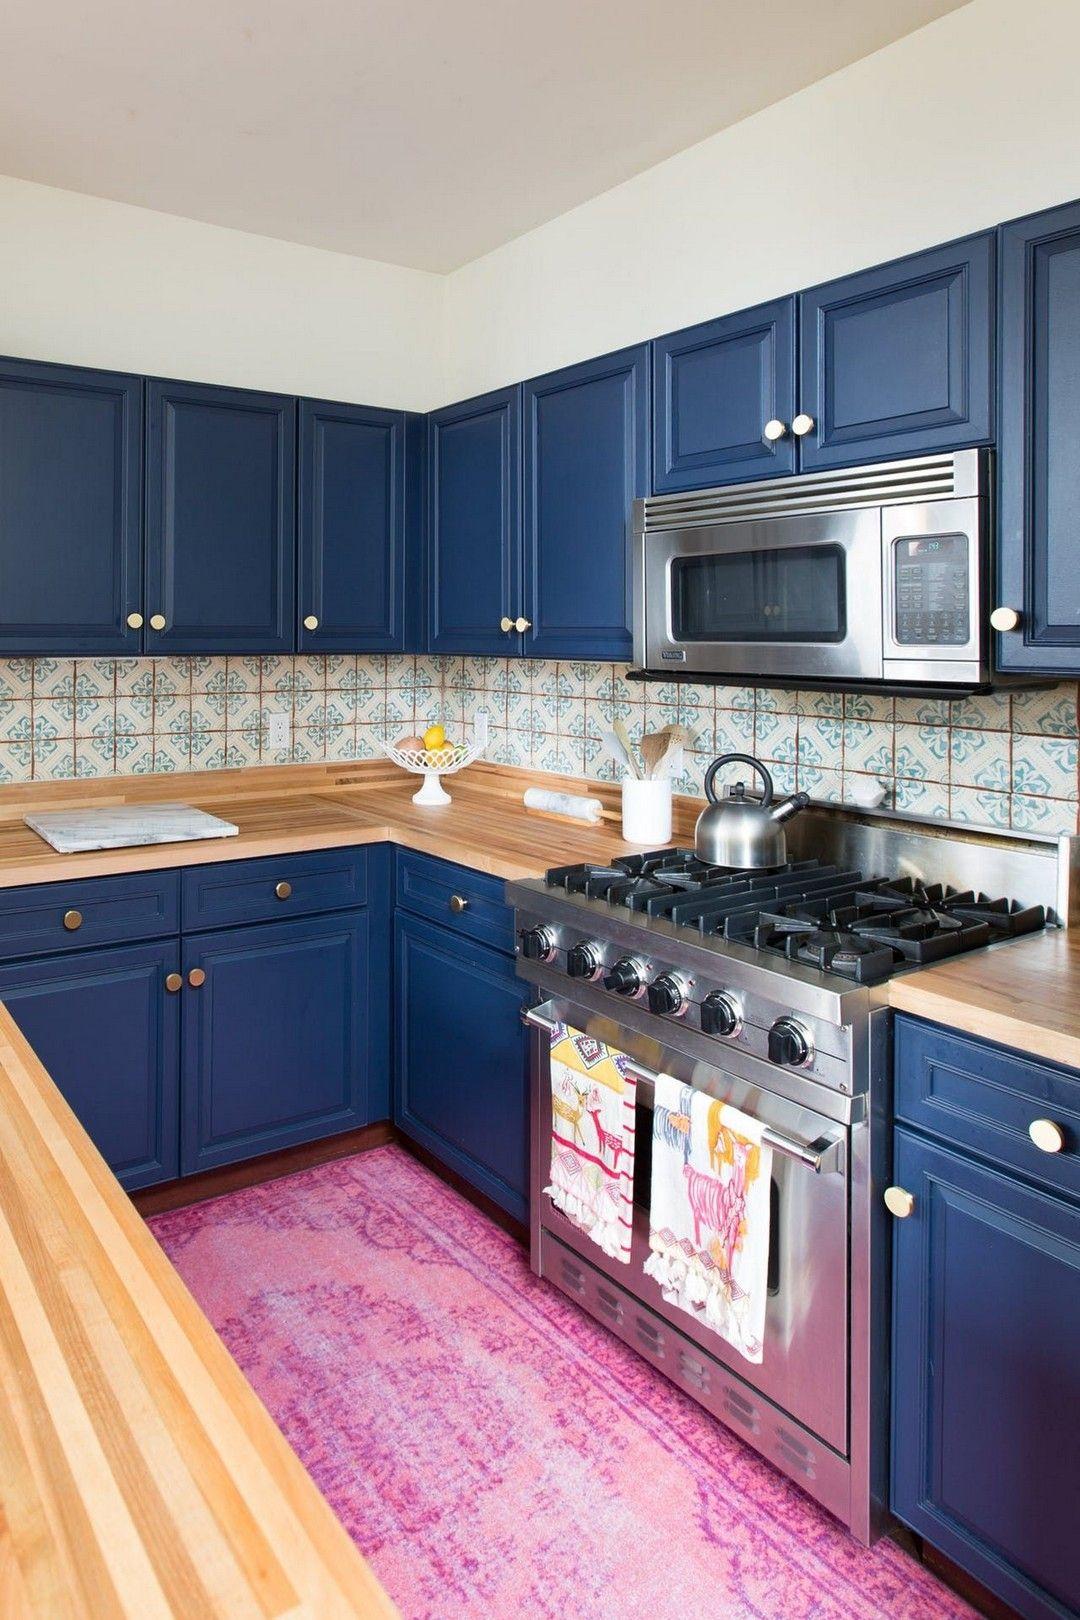 41 gorgeous blue kitchen cabinet ideas https kitchendecorpad com 2018